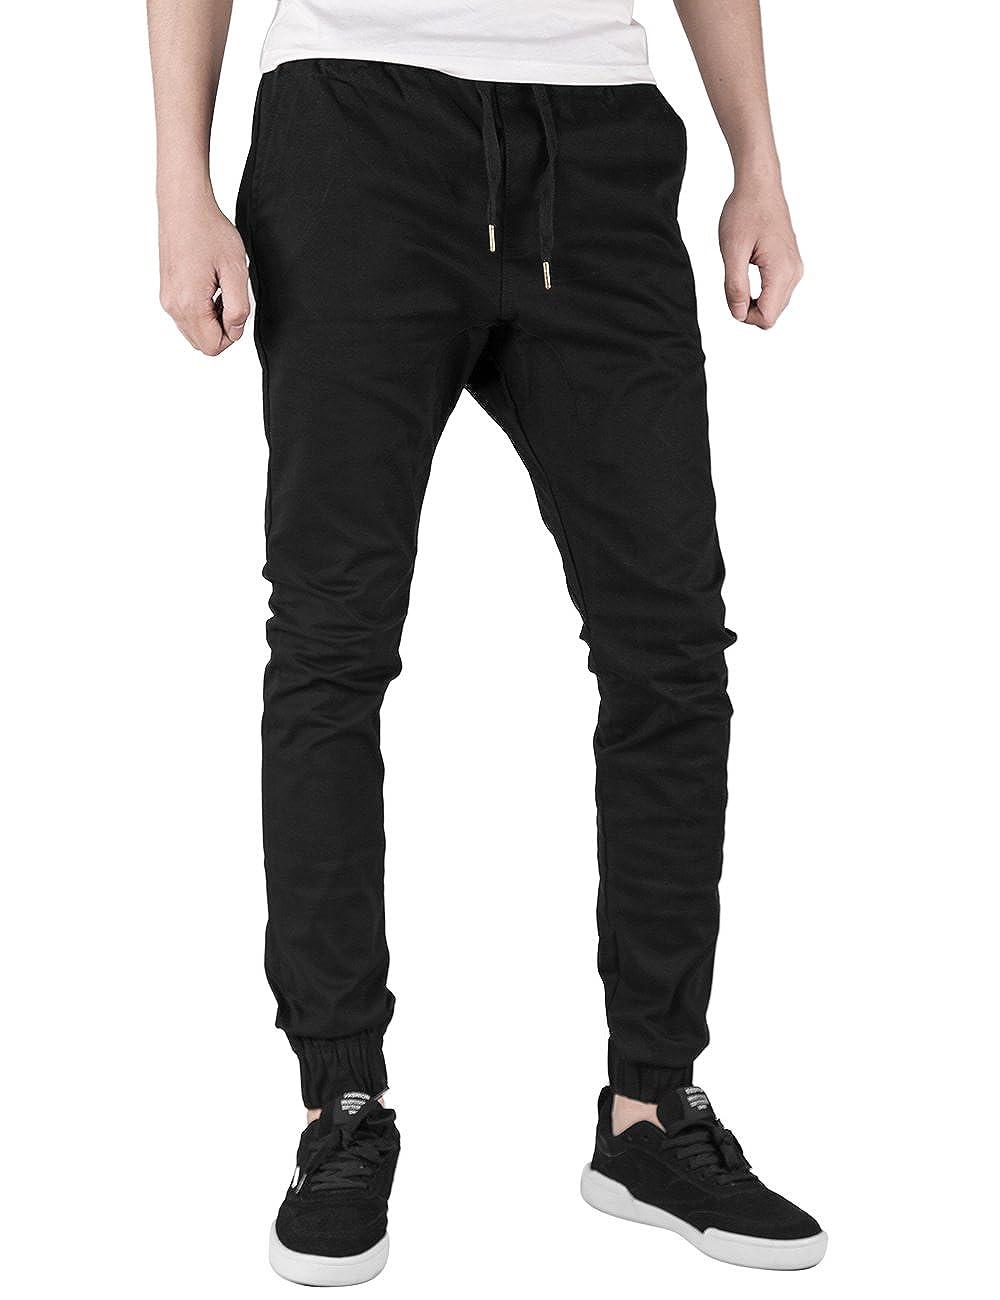 251e60db1 Italy Morn Men's Casual Chino Jogger Trousers: Amazon.co.uk: Clothing